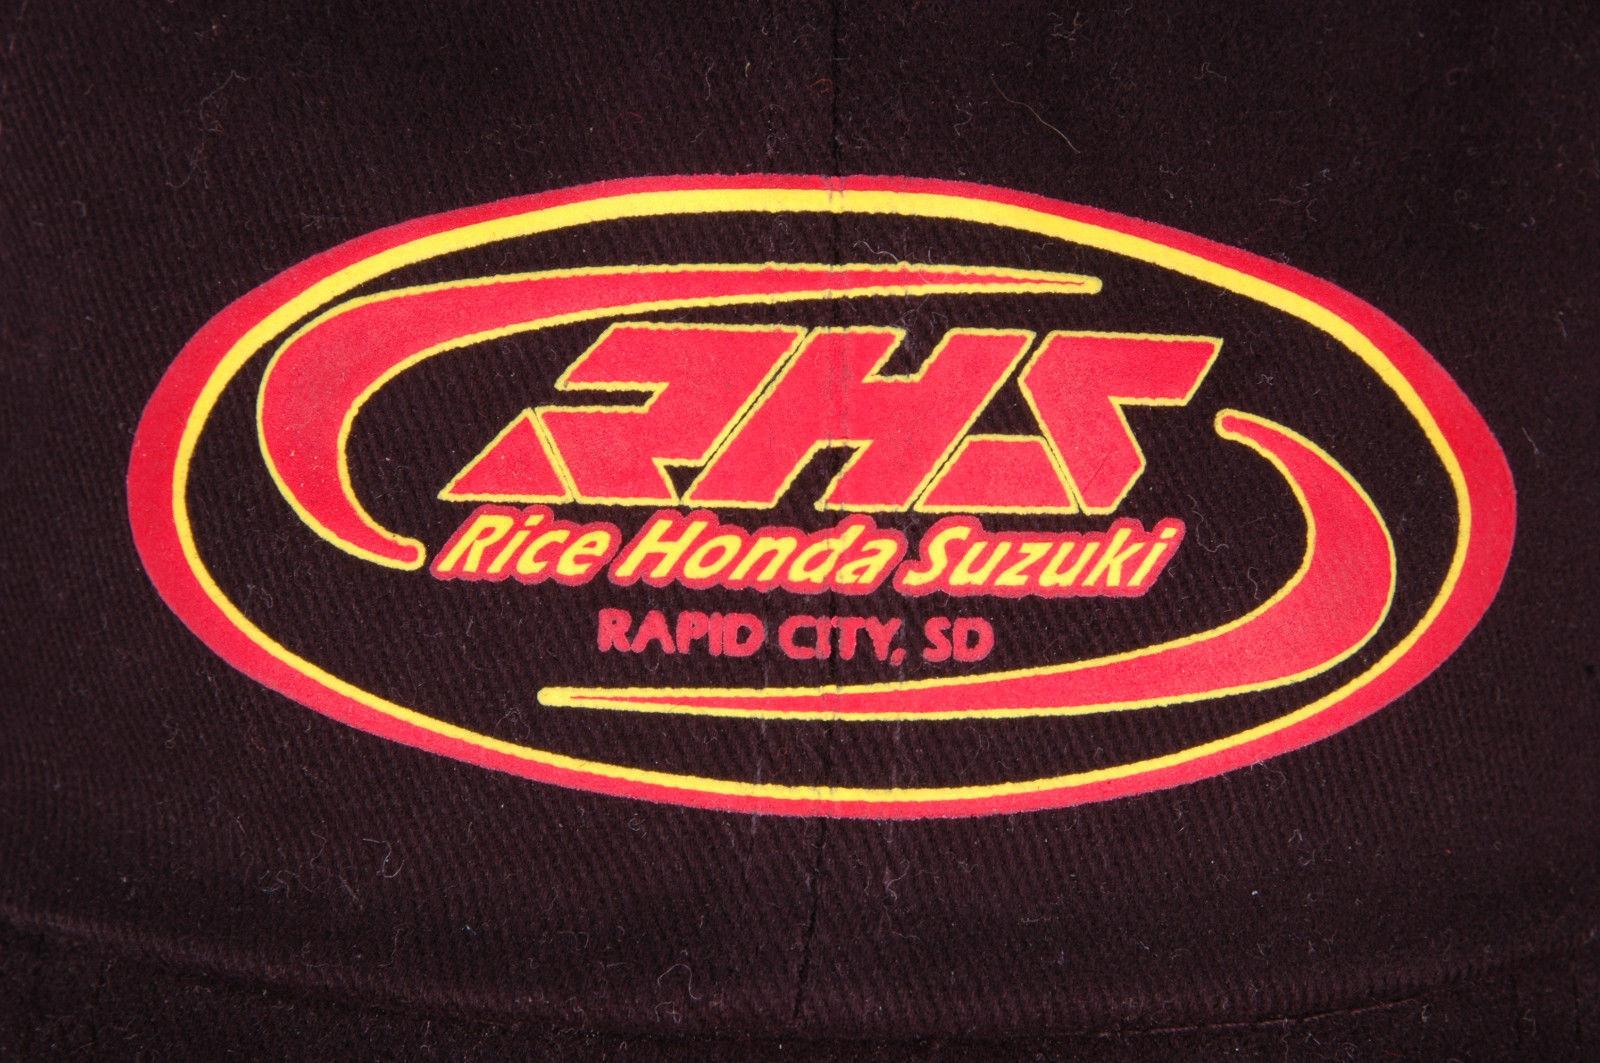 RHS Rice Honda Suzuki Hat-Rapid City SD-Strapback-Black-Cotton-Metal Eyelets-Vtg